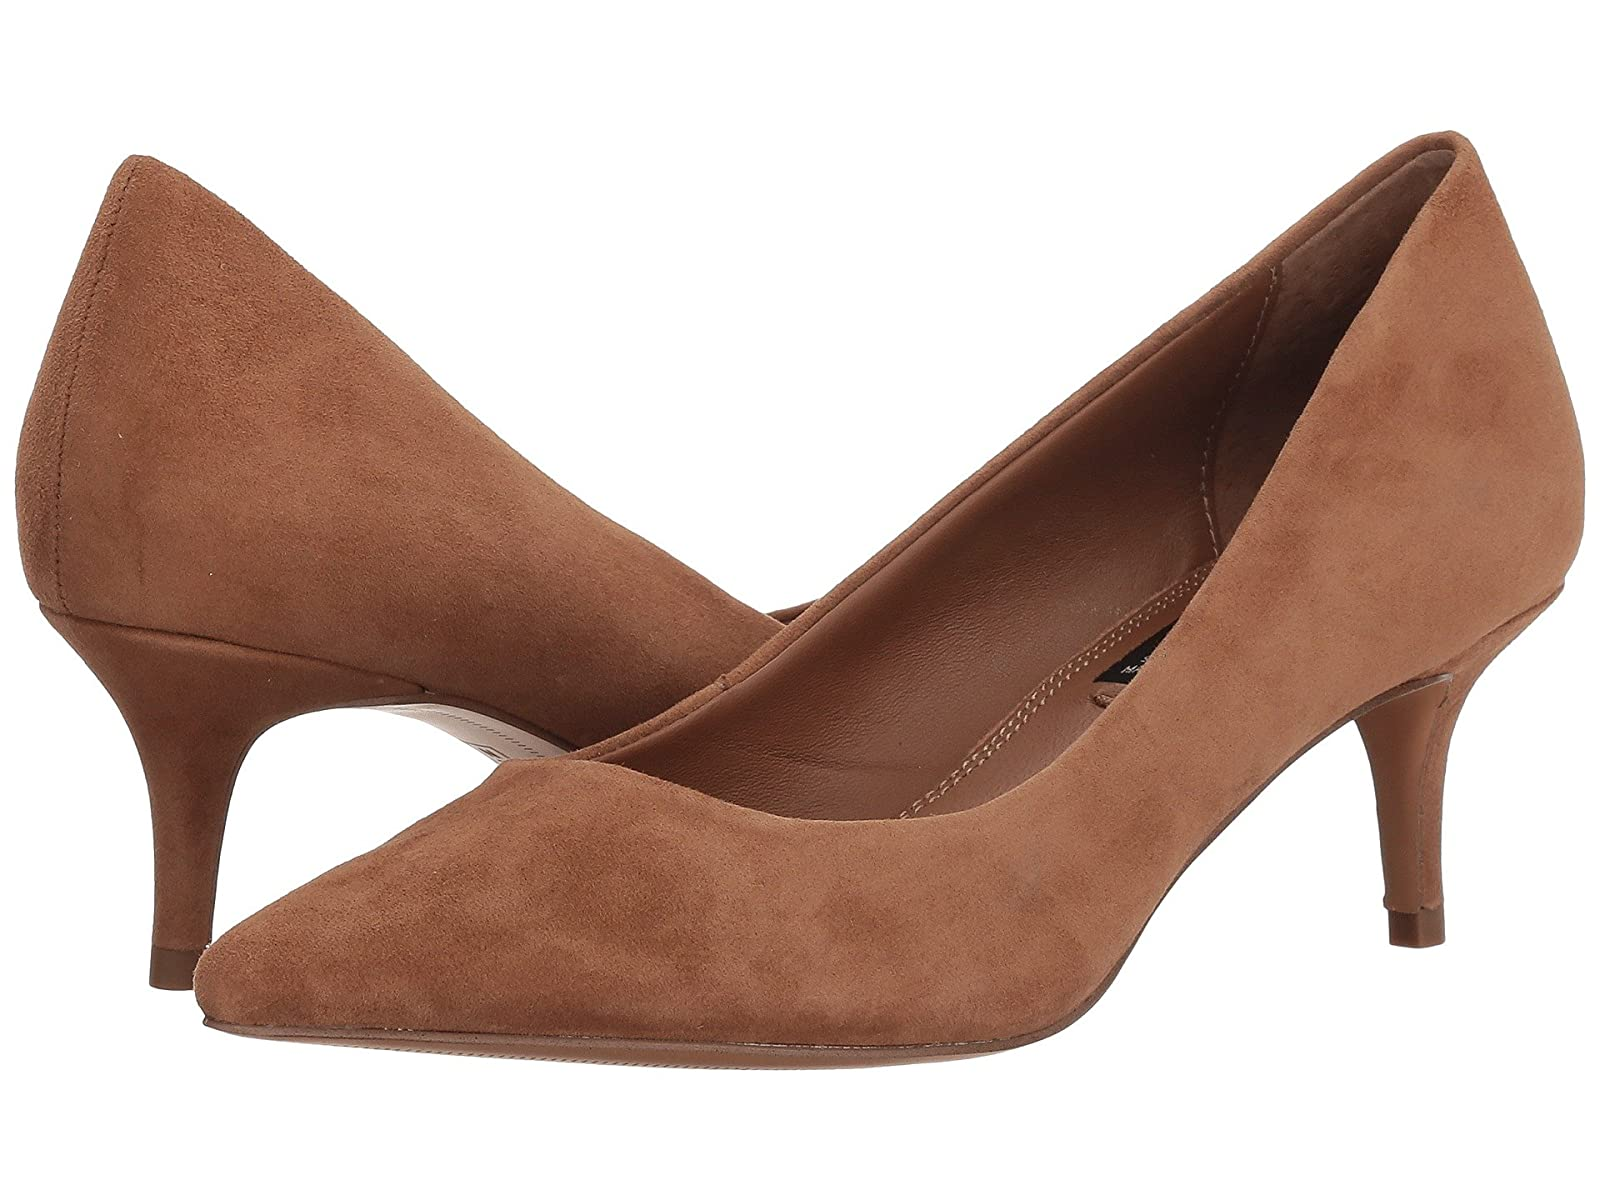 Steven KavaCheap and distinctive eye-catching shoes